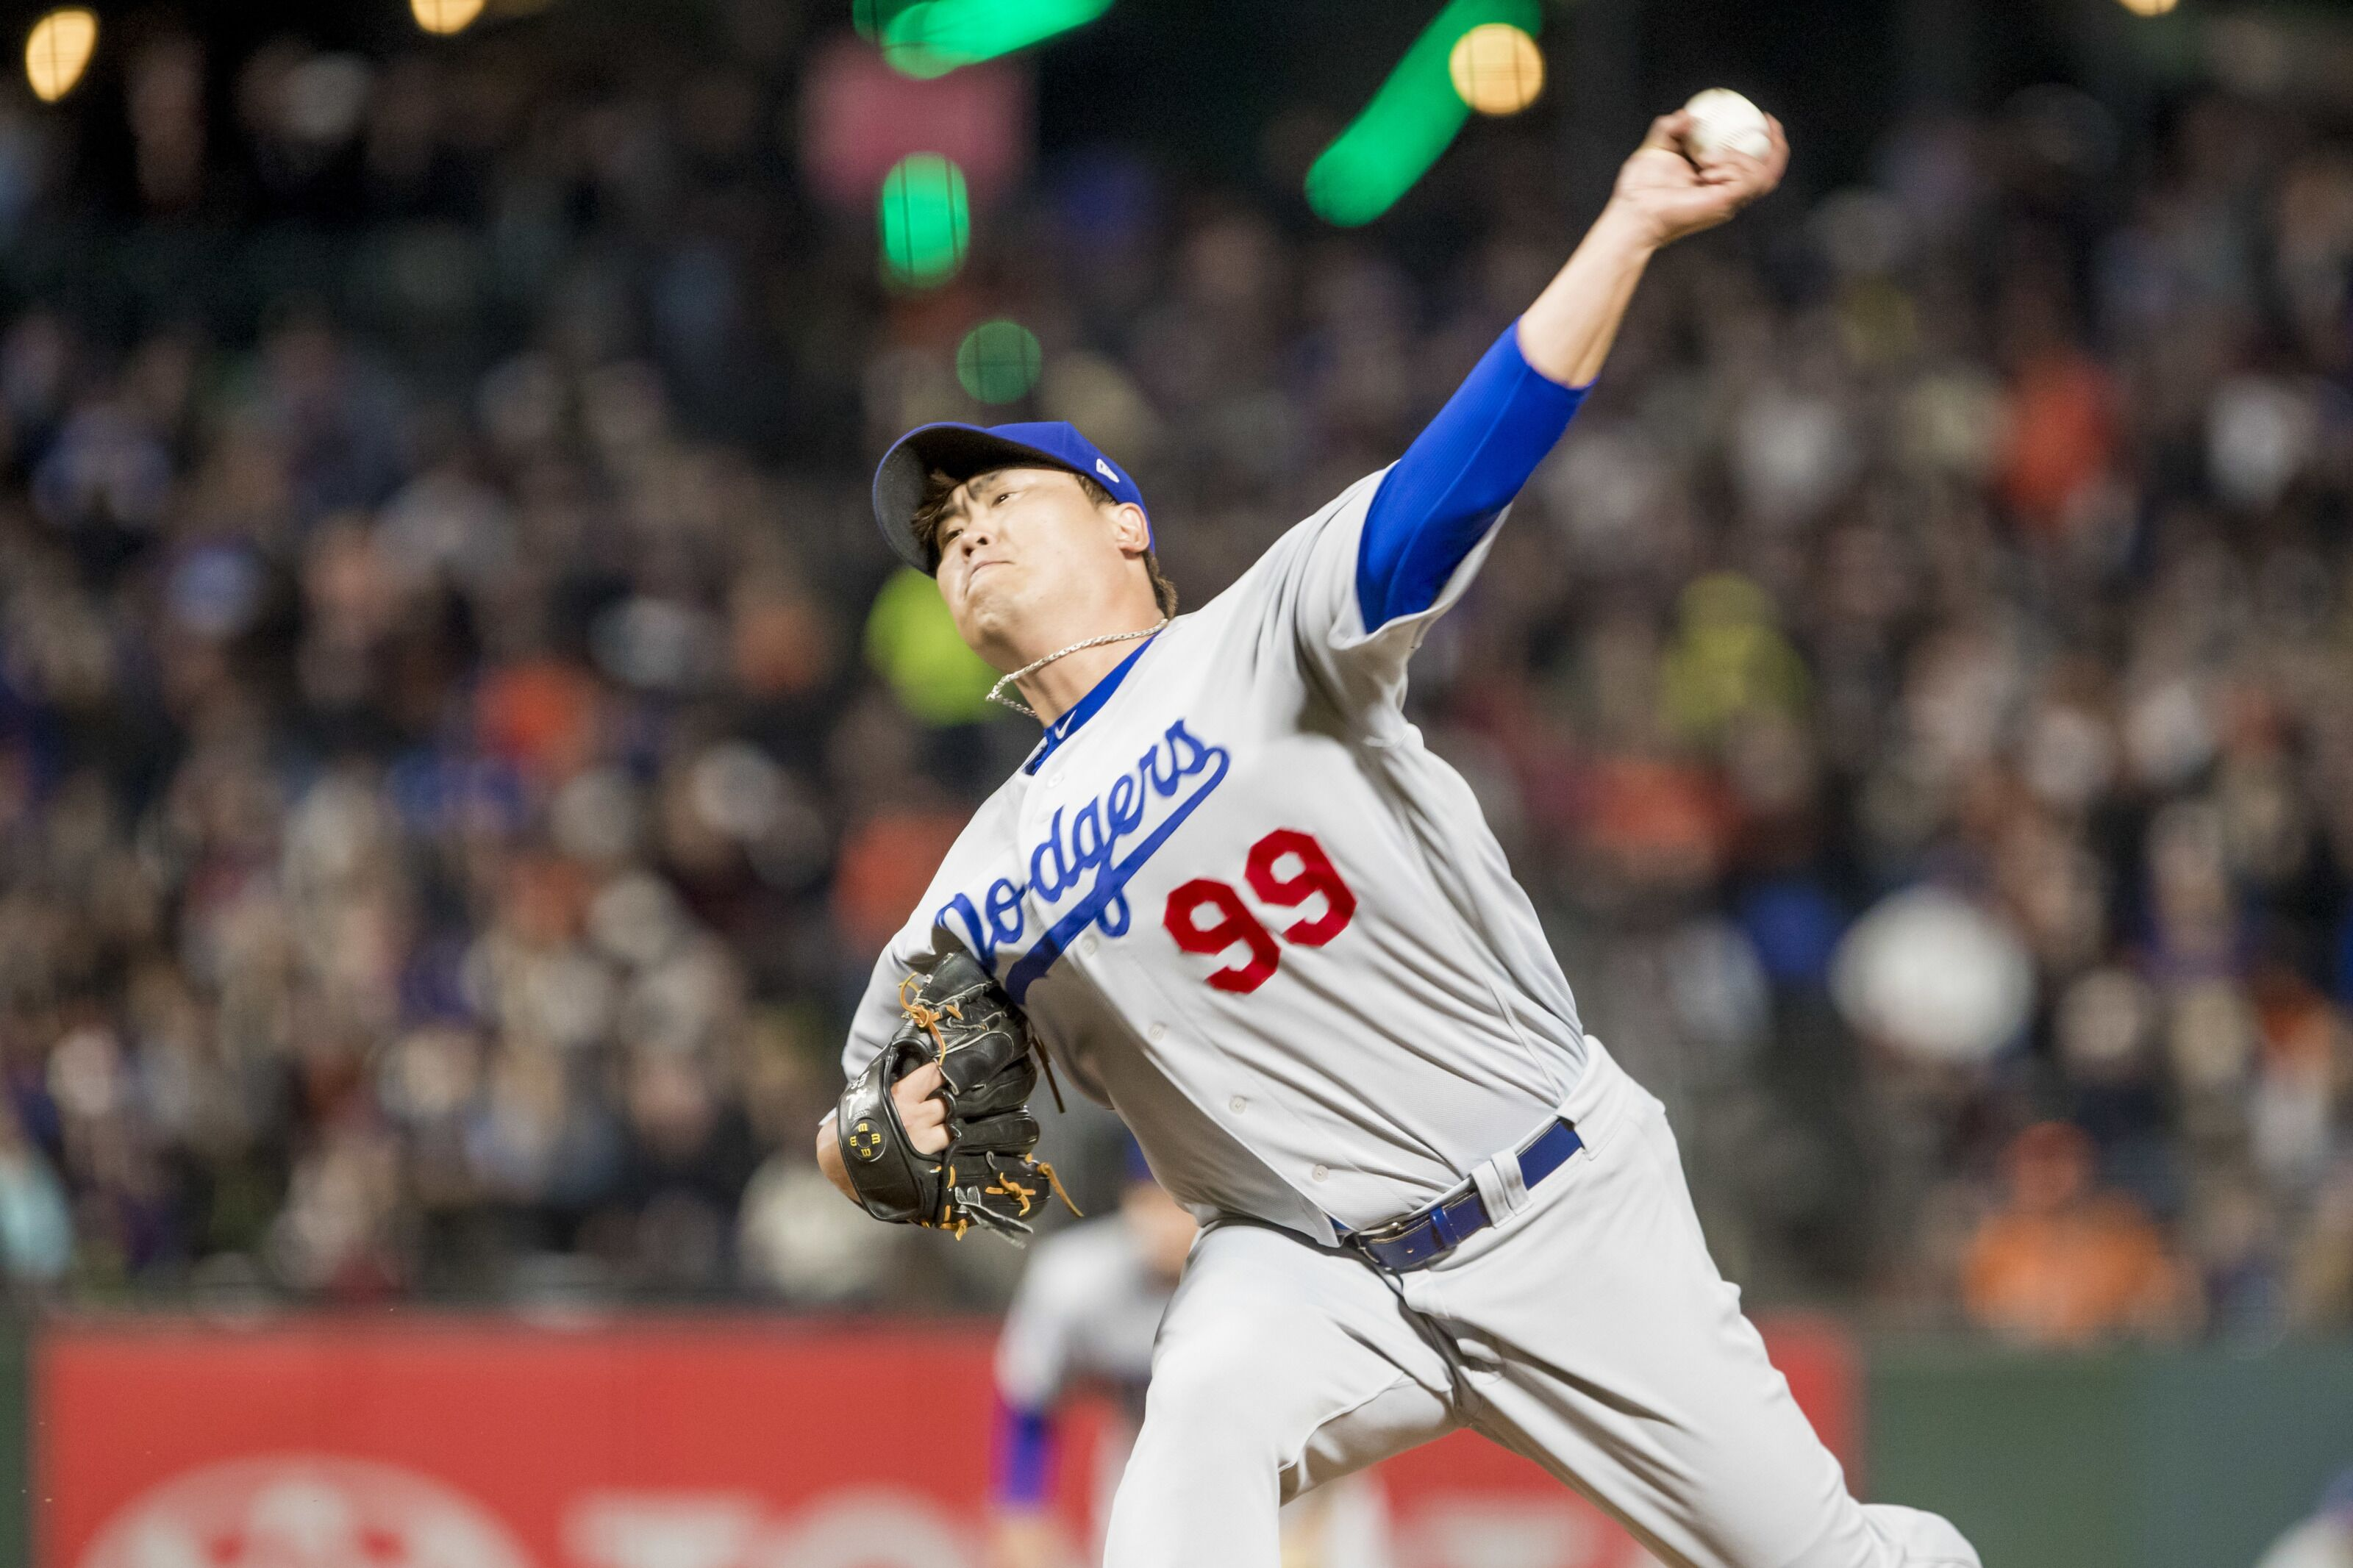 fcb92b121a4 Los Angeles Dodgers gamble with Hyun-Jin Ryu against Atlanta Braves